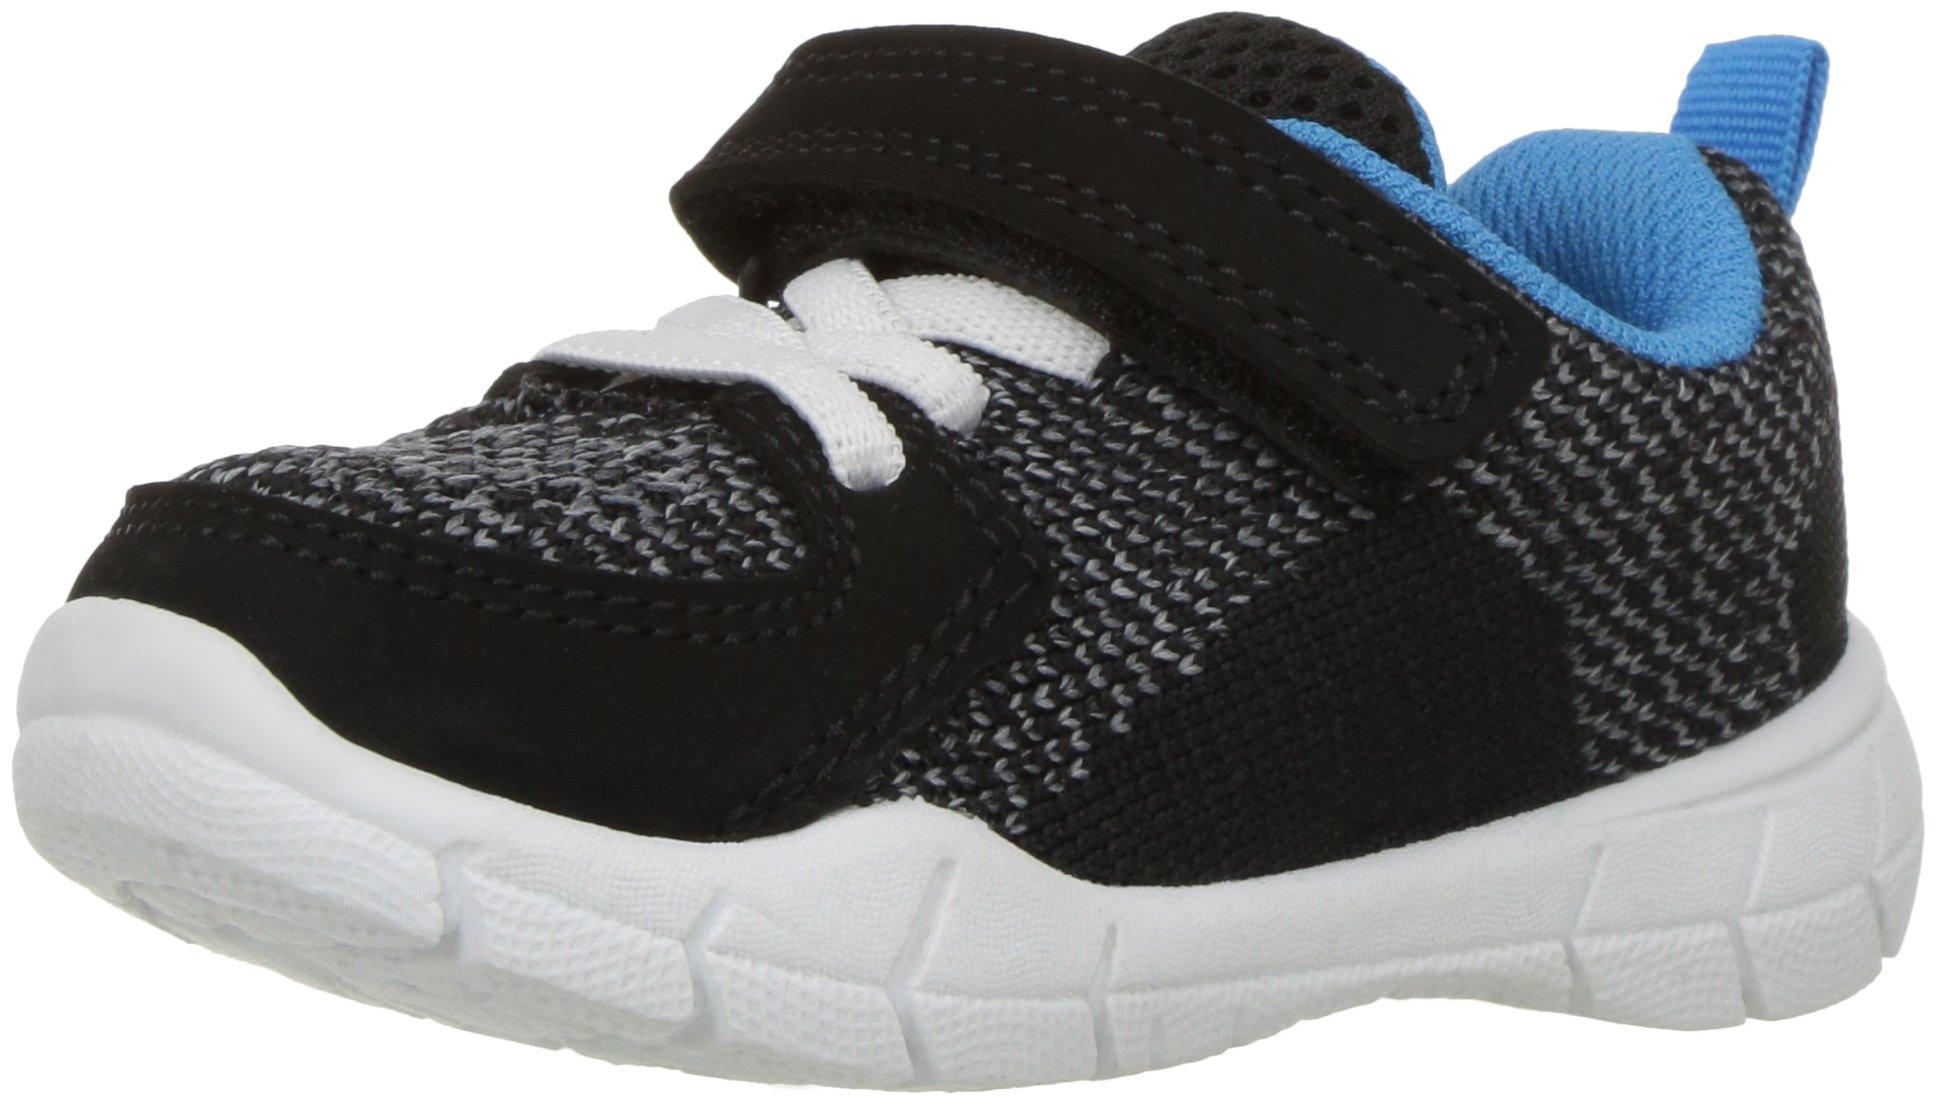 Carter's Boys' Avion-B Athletic Sneaker, Black, 6 M US Toddler